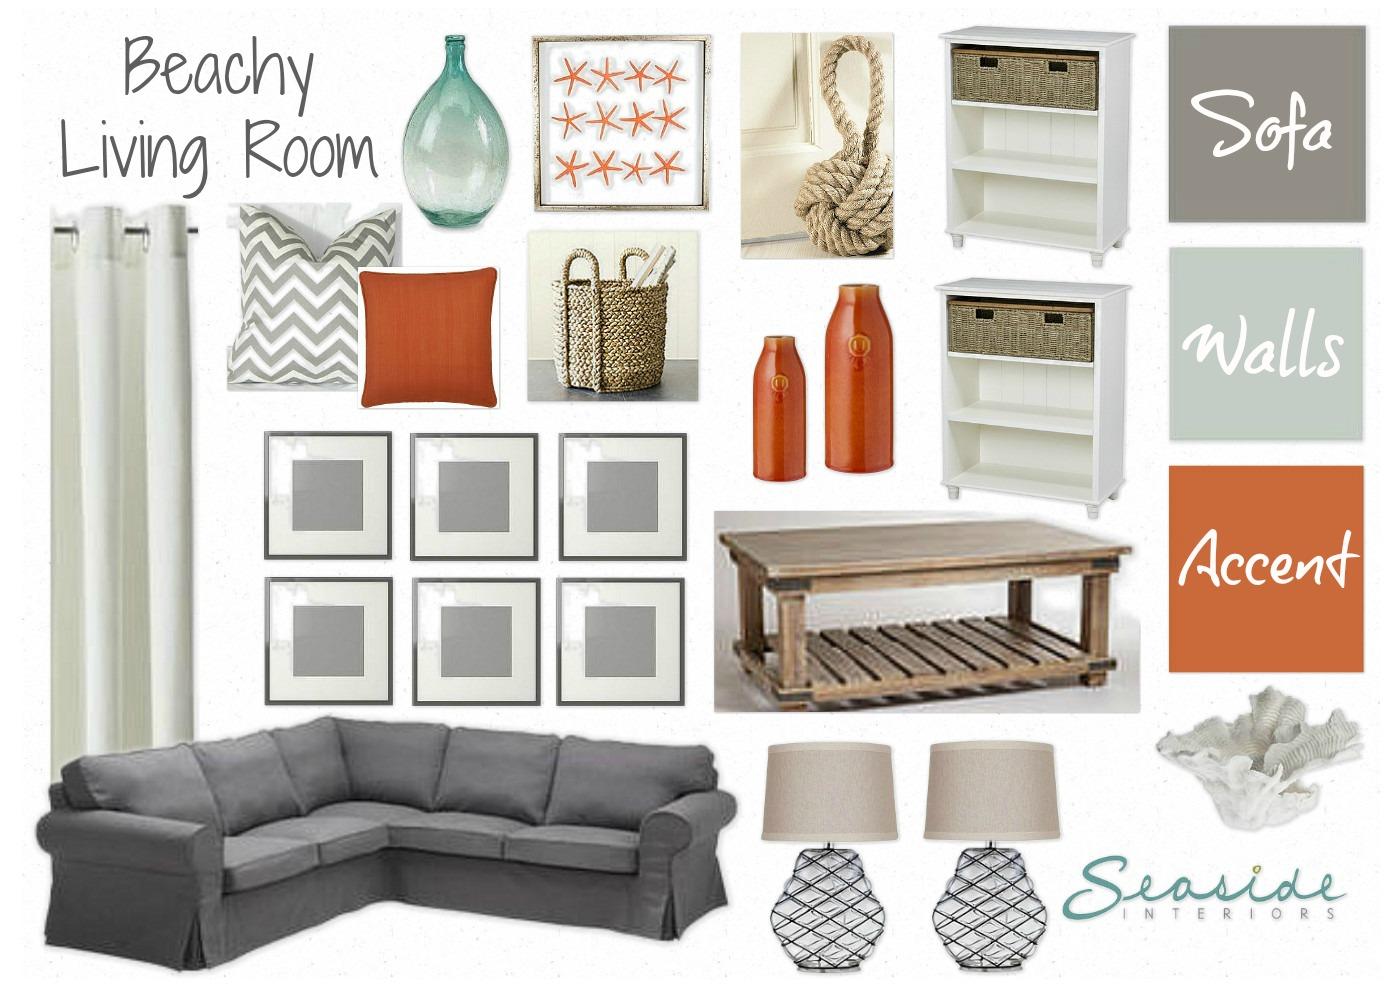 Seaside Interiors: Beachy Living Room with grays and orange!!!